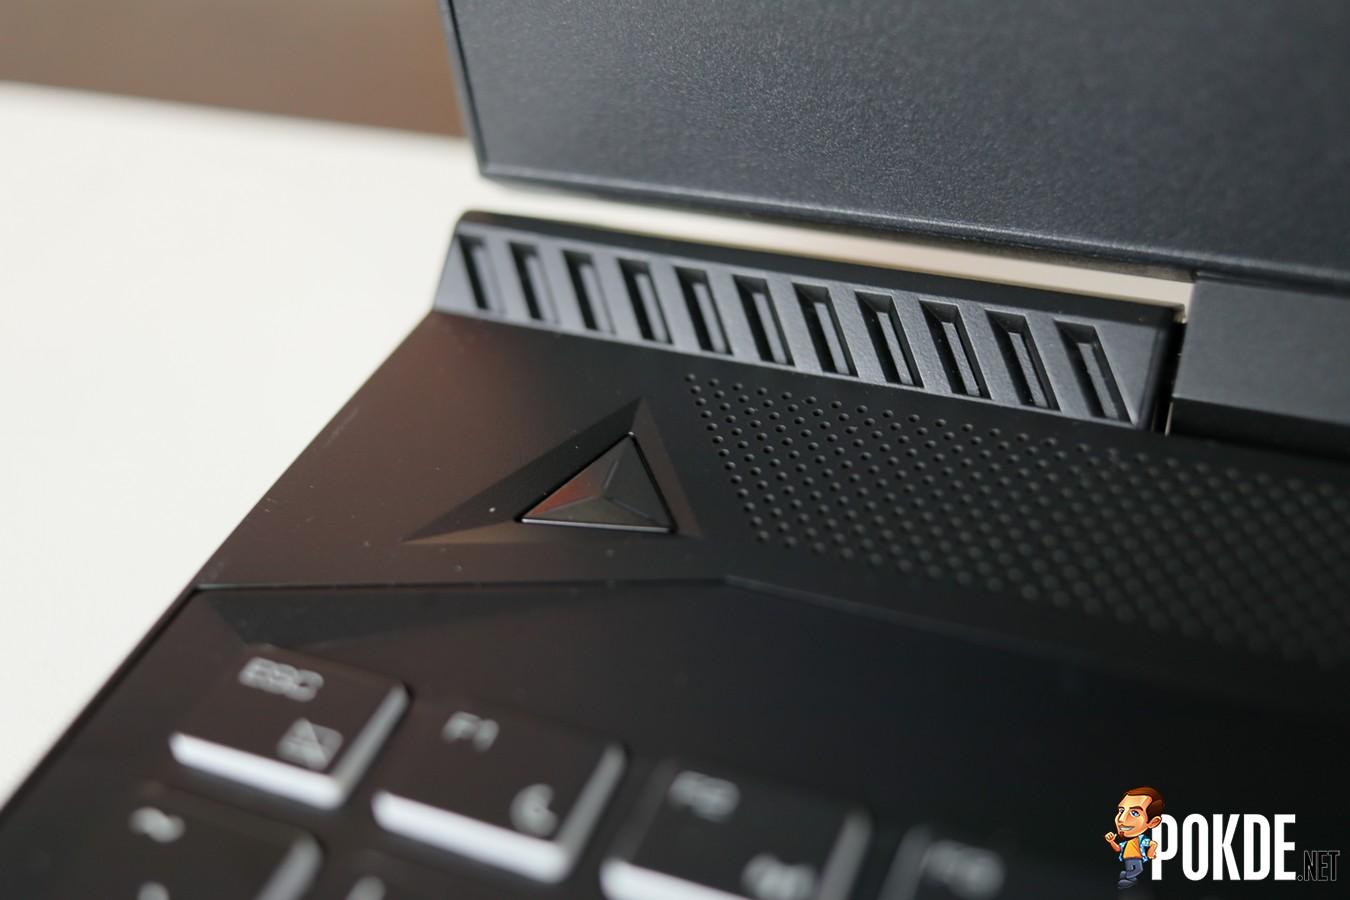 GIGABYTE AORUS 5 NA Gaming Laptop Review – Pokde